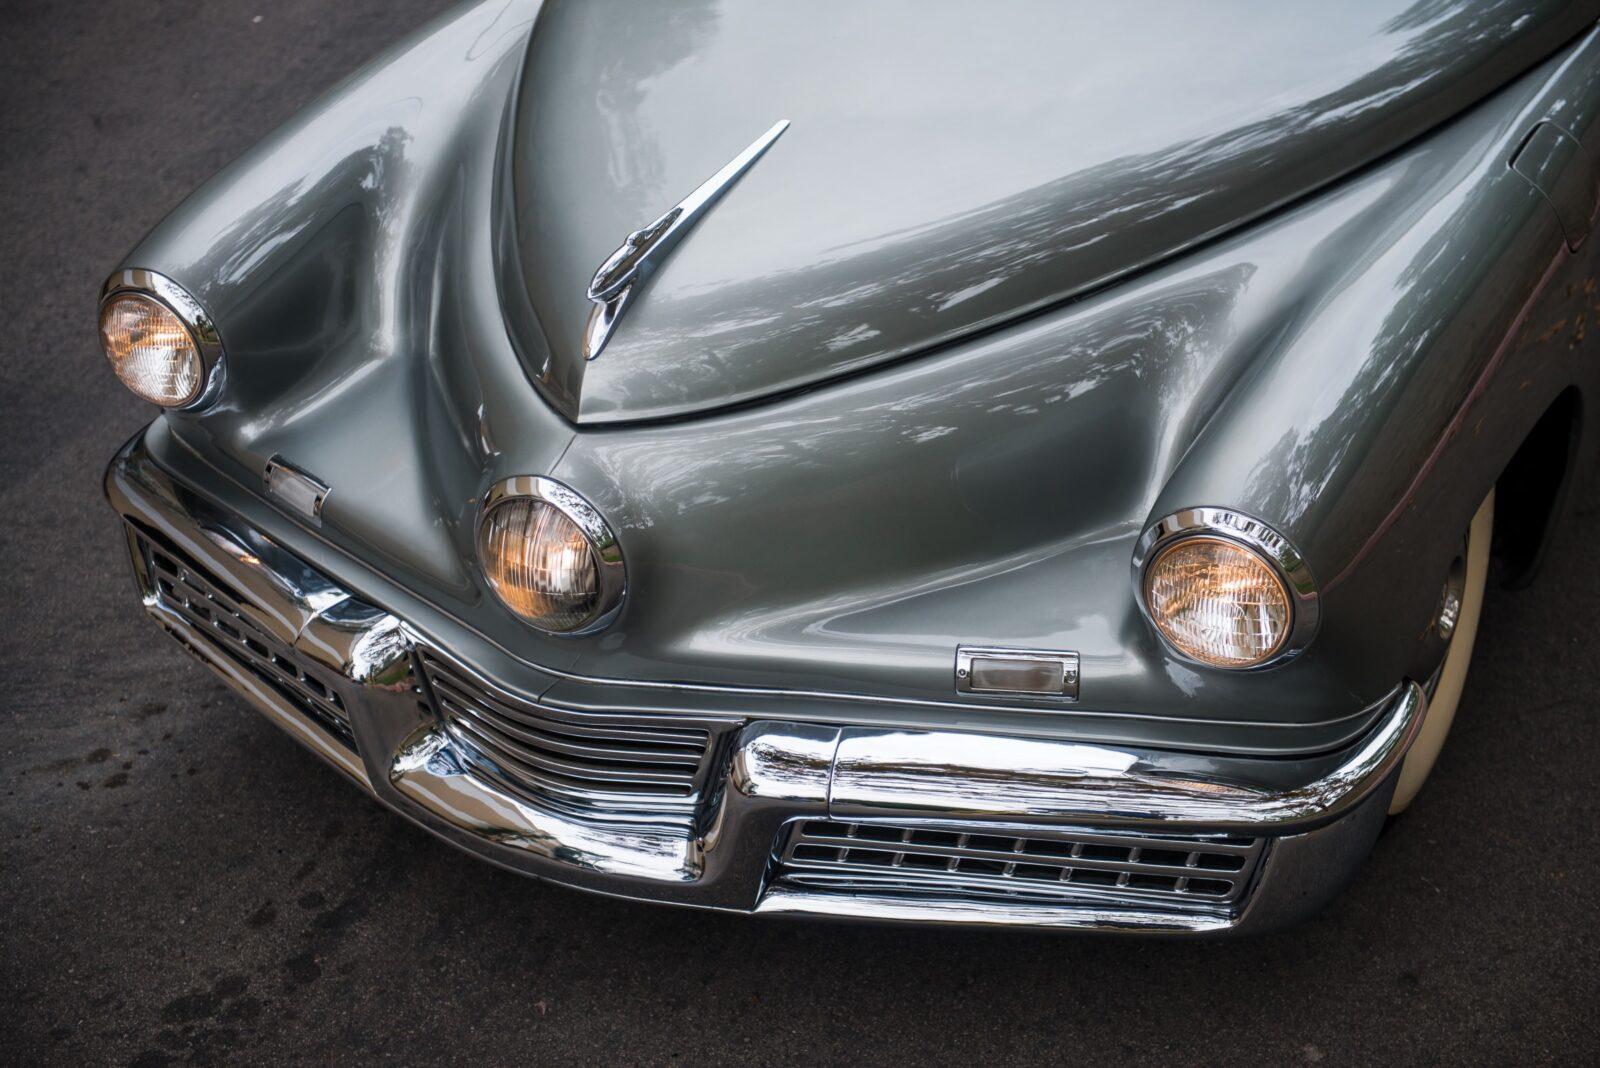 tucker 48 car 7 1600x1068 - Preston Tucker's Own Personal Tucker 48